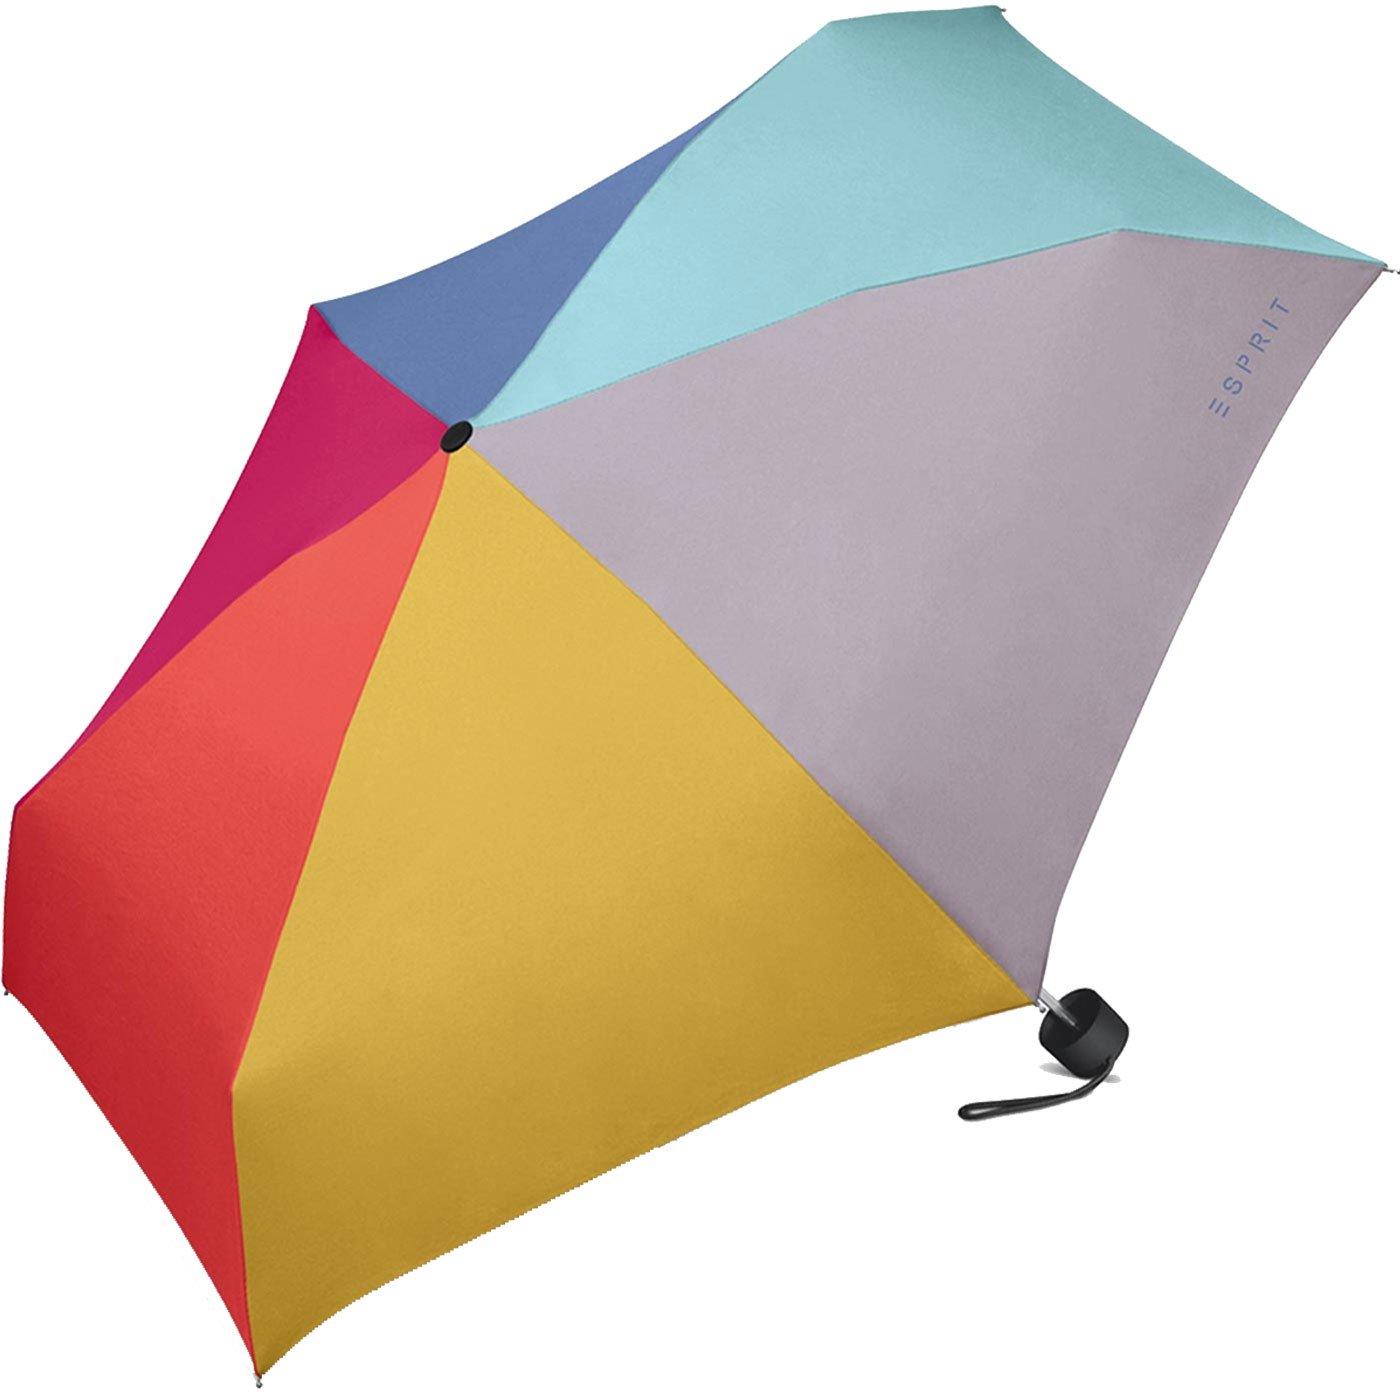 ESPRIT Petito, Parapluie pliants multicolore Arc-en-ciel 93 cm